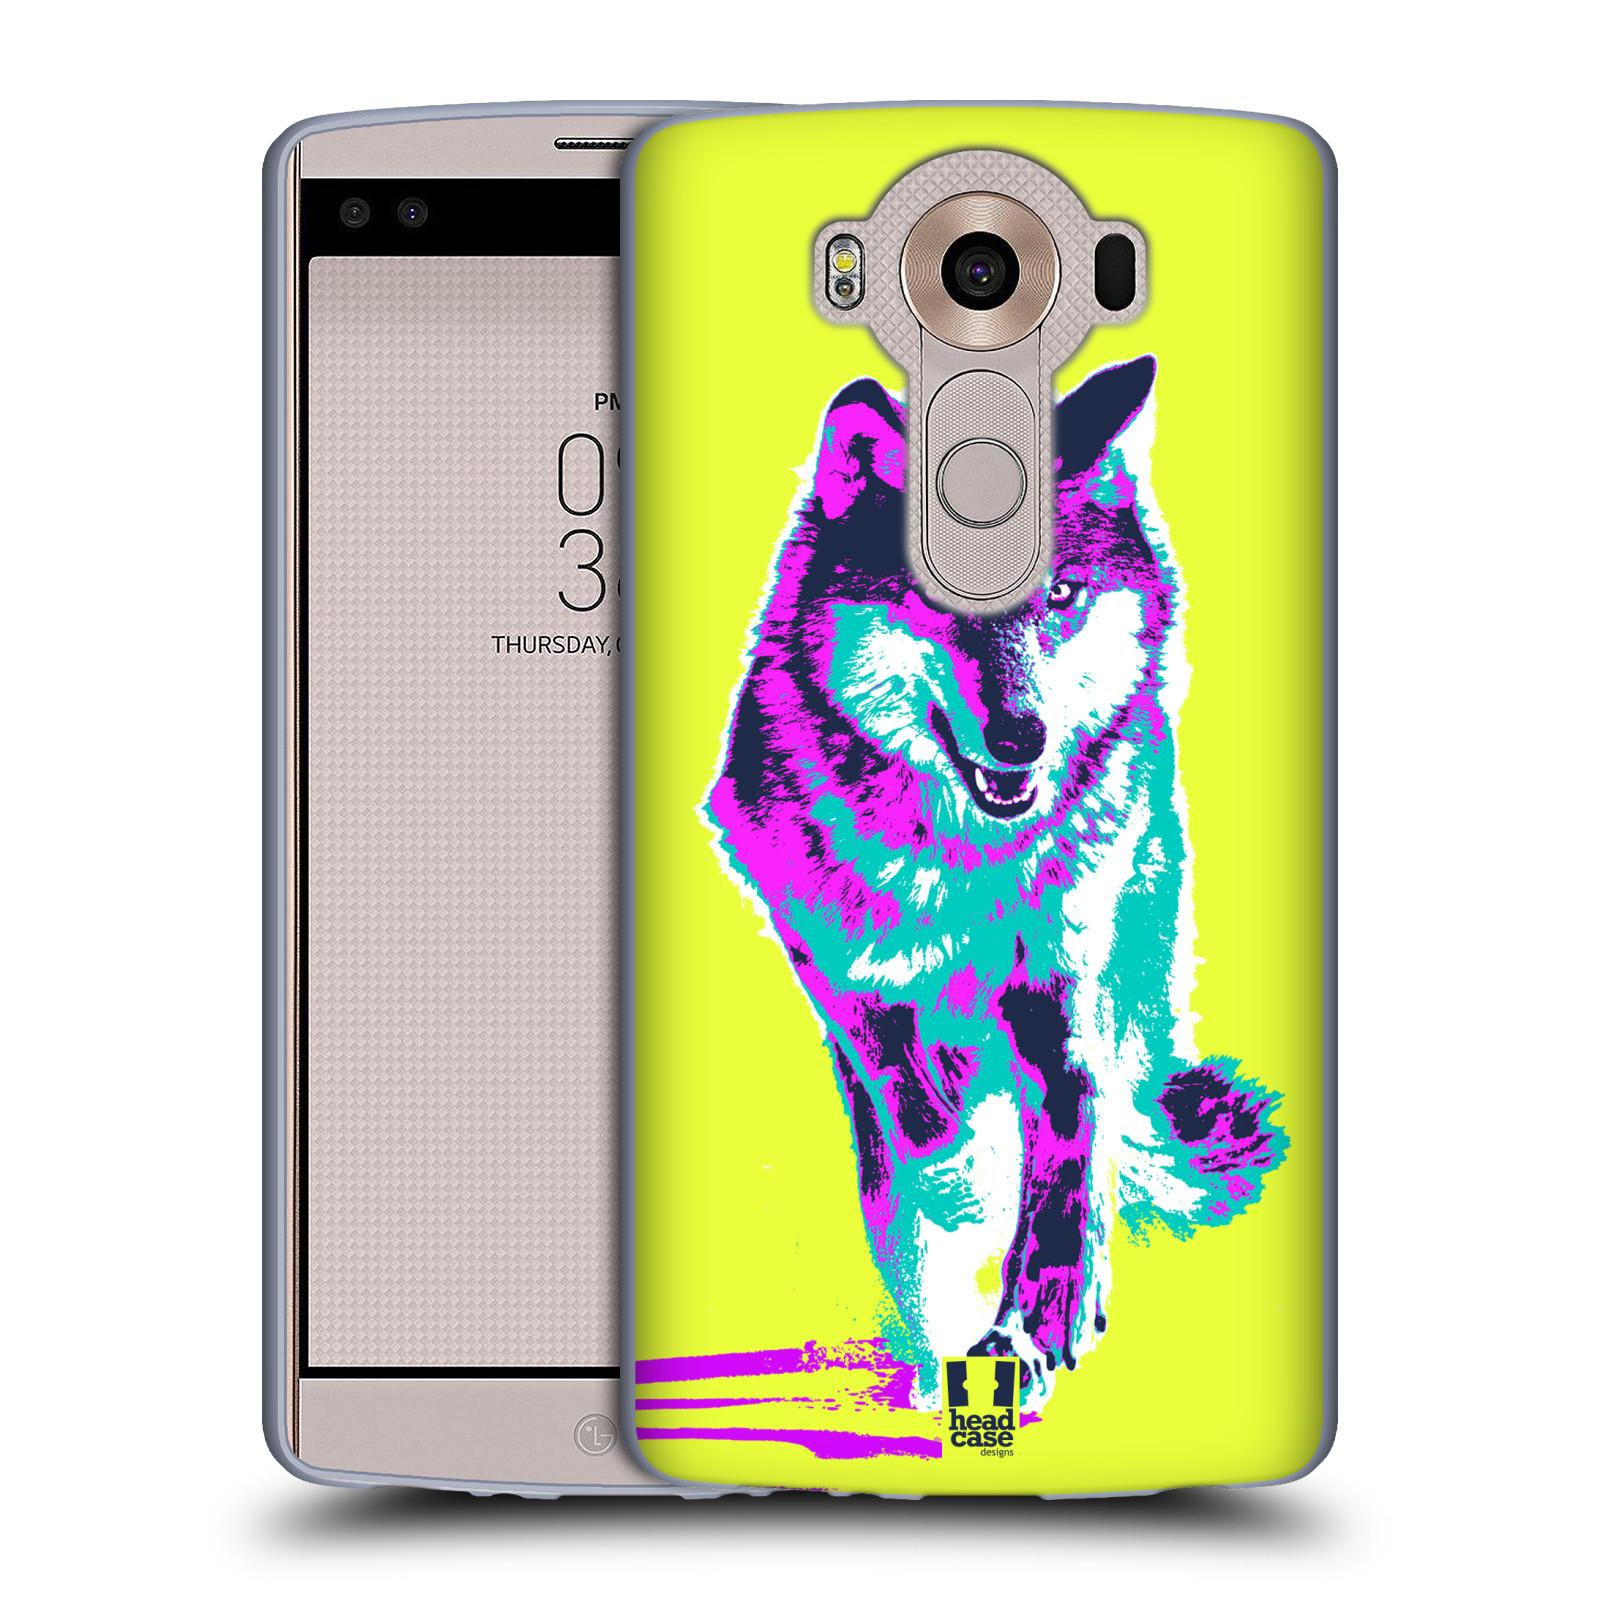 Silikonové pouzdro na mobil LG V10 HEAD CASE POP PRINT VLK (Silikonový kryt či obal na mobilní telefon LG V10 H960 / H960A)